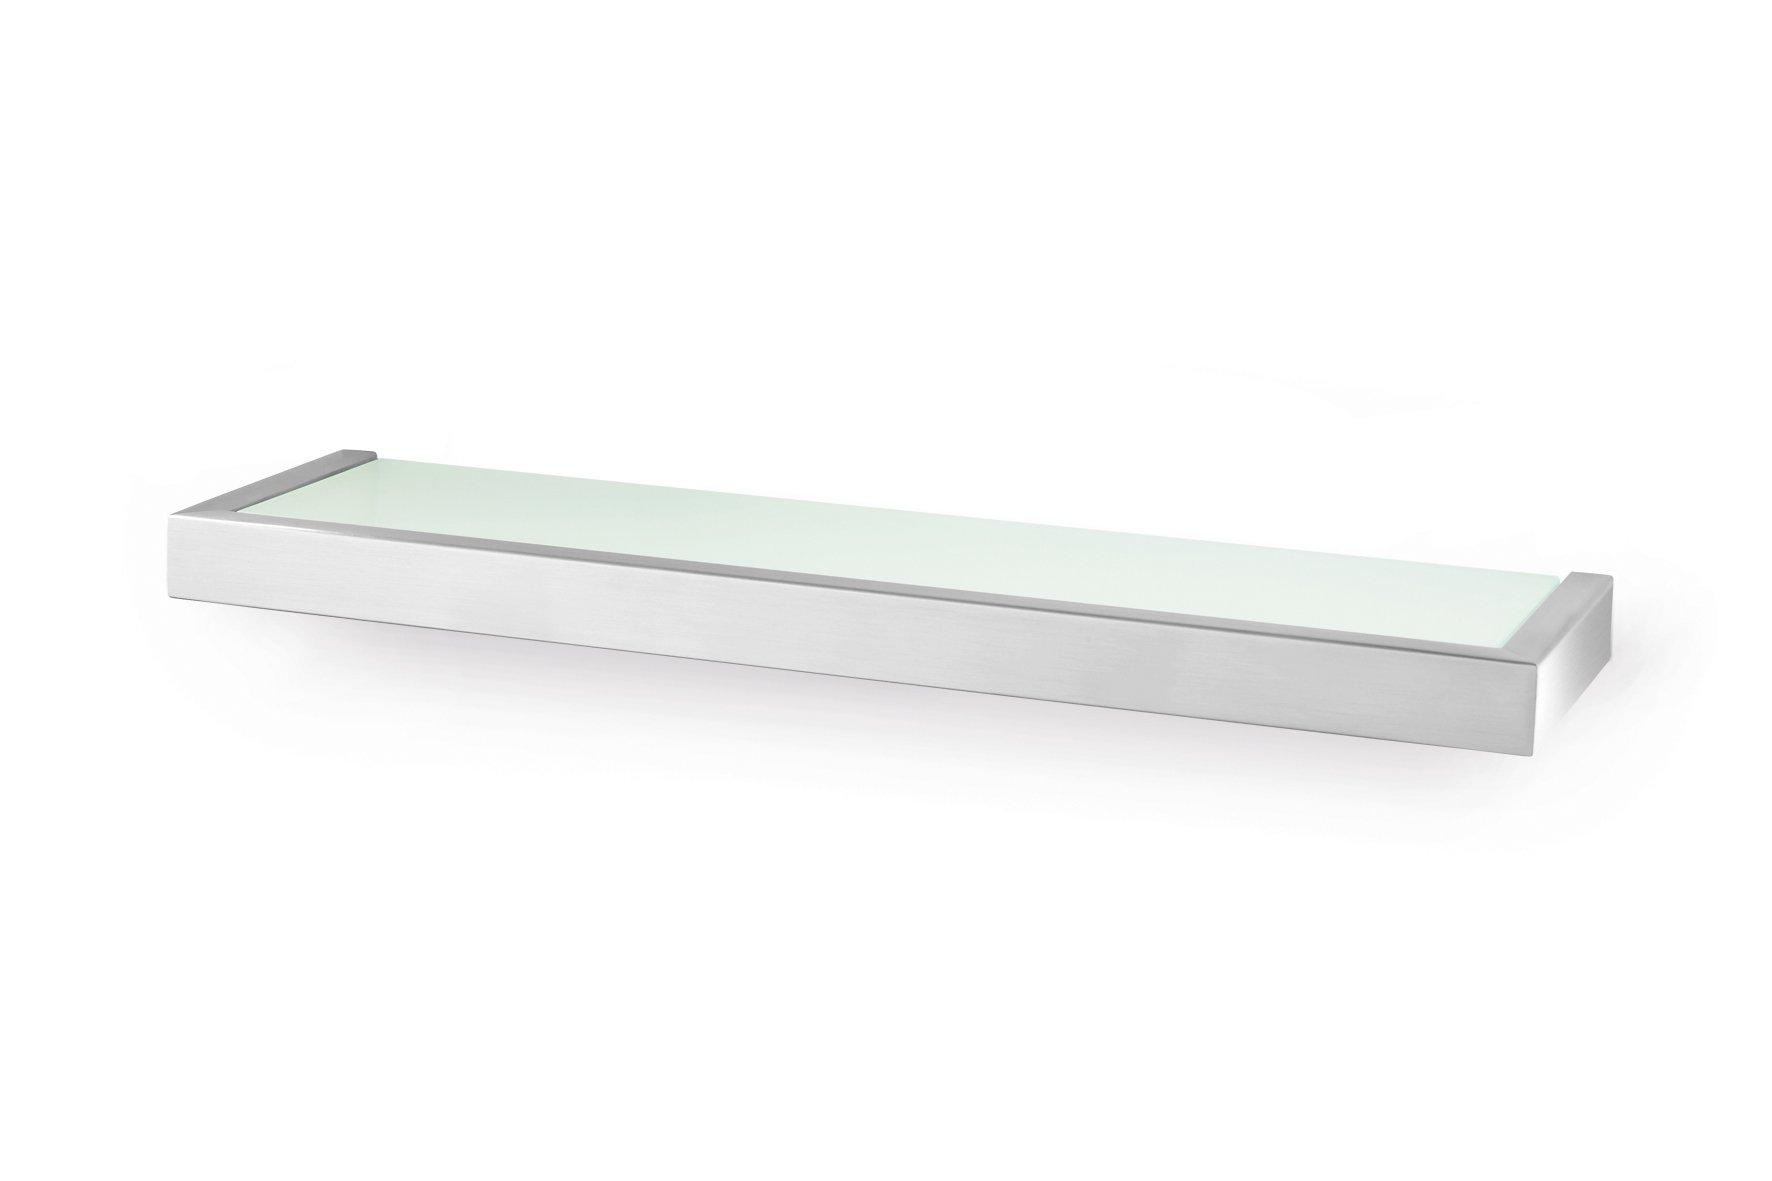 ZACK 40384 Linea Medium Size Bathroom Shelf